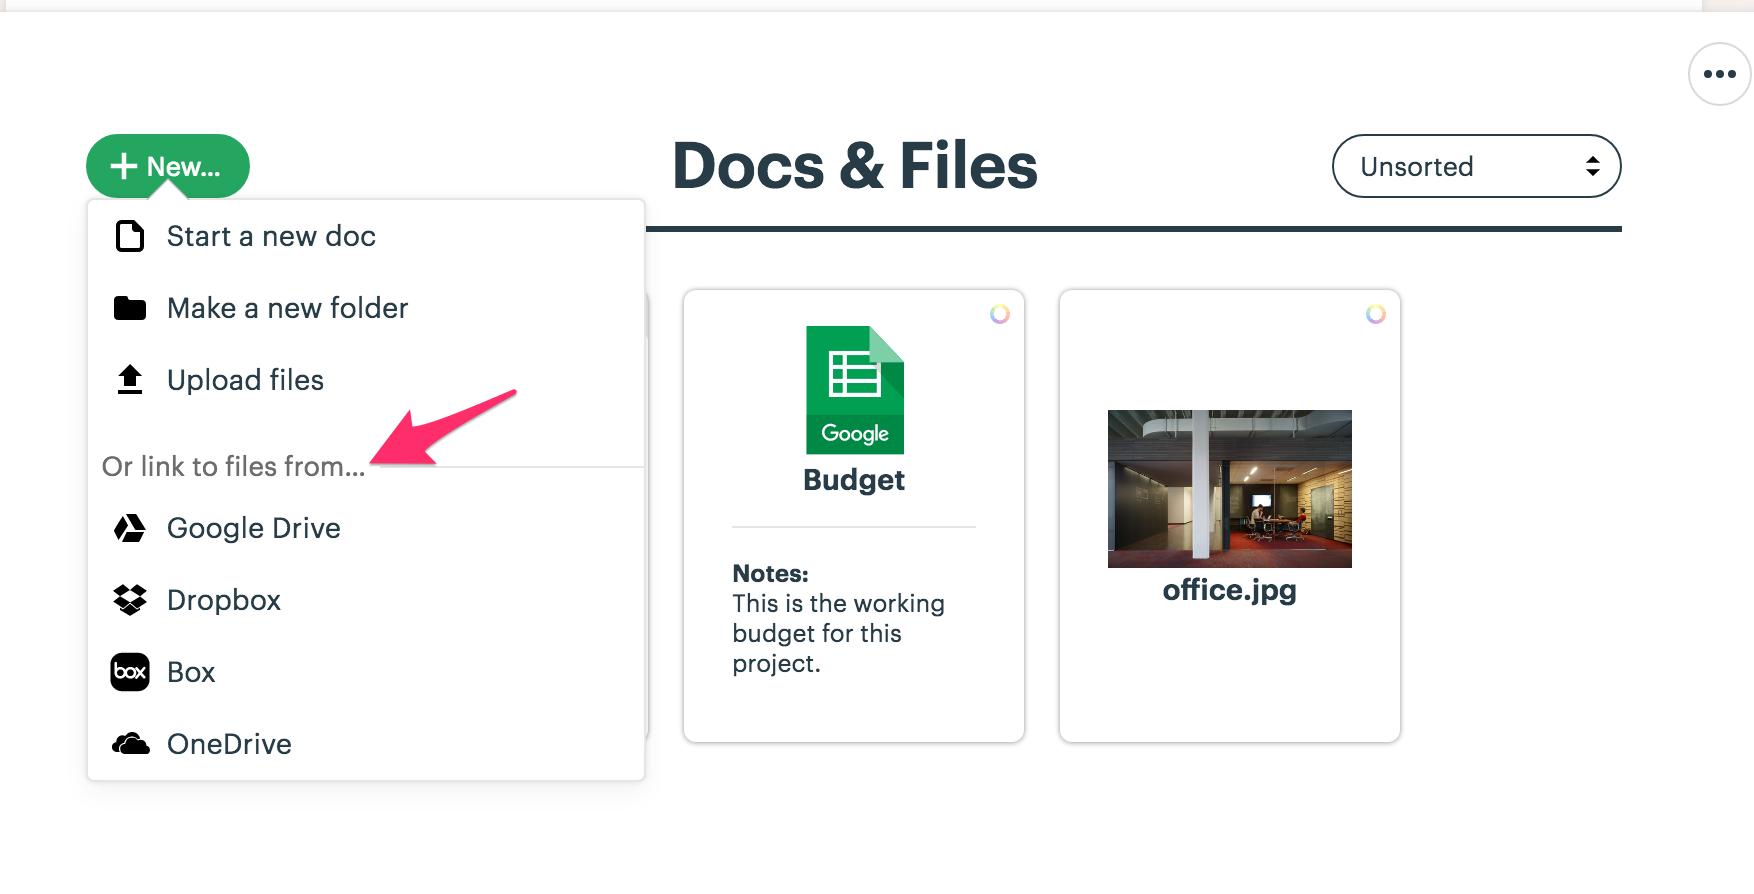 Docs & Files - Basecamp 3 Help